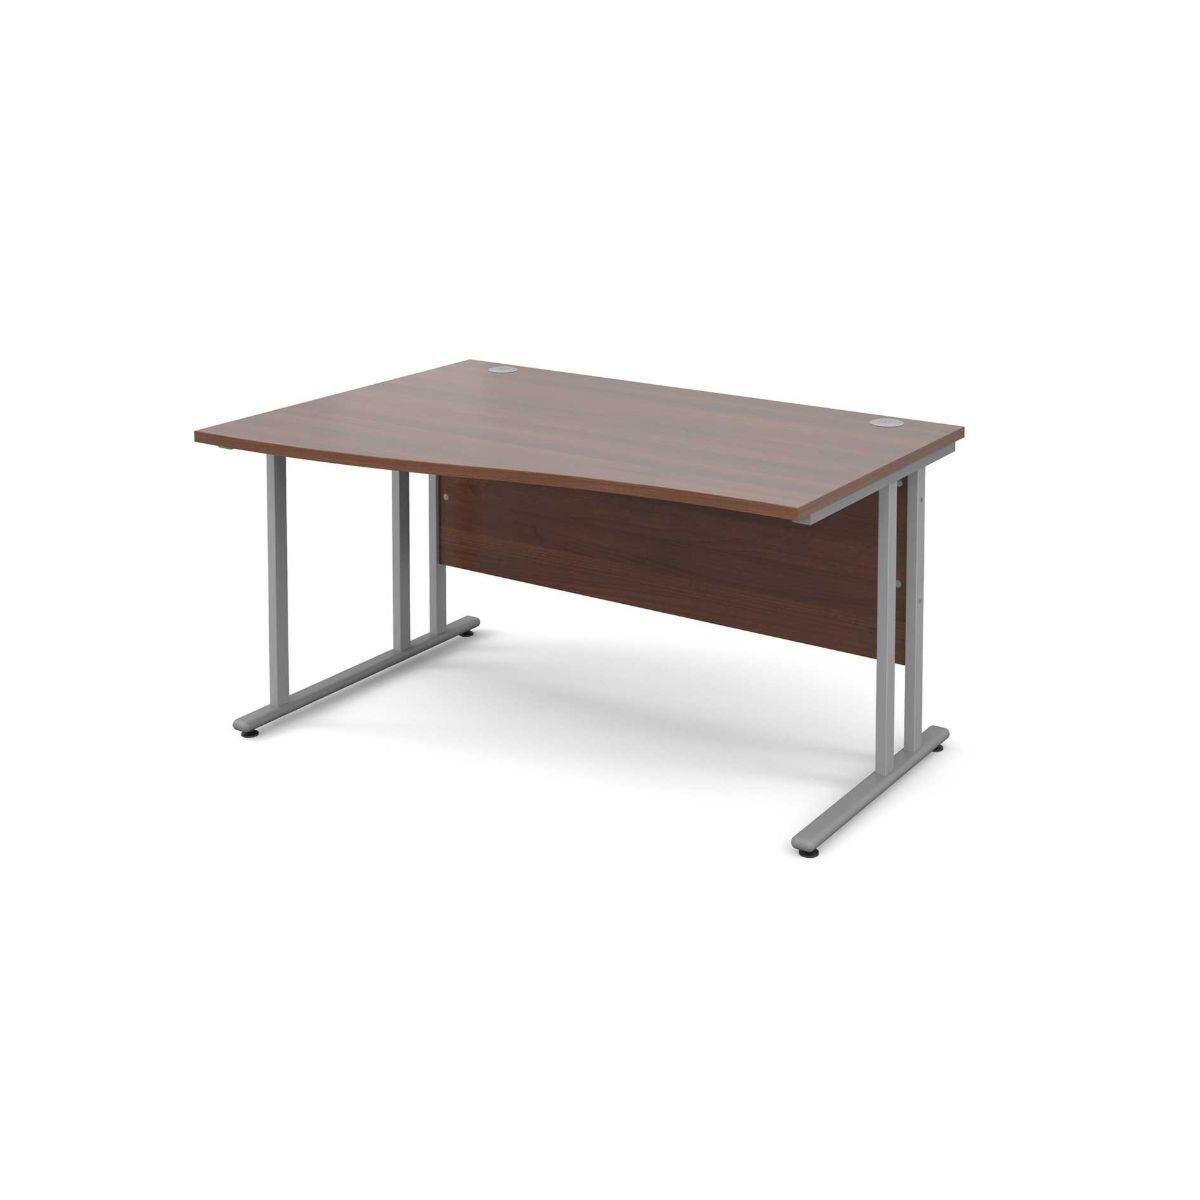 Maestro 25 Left Hand Wave 1400 Desk with Silver Legs walnut